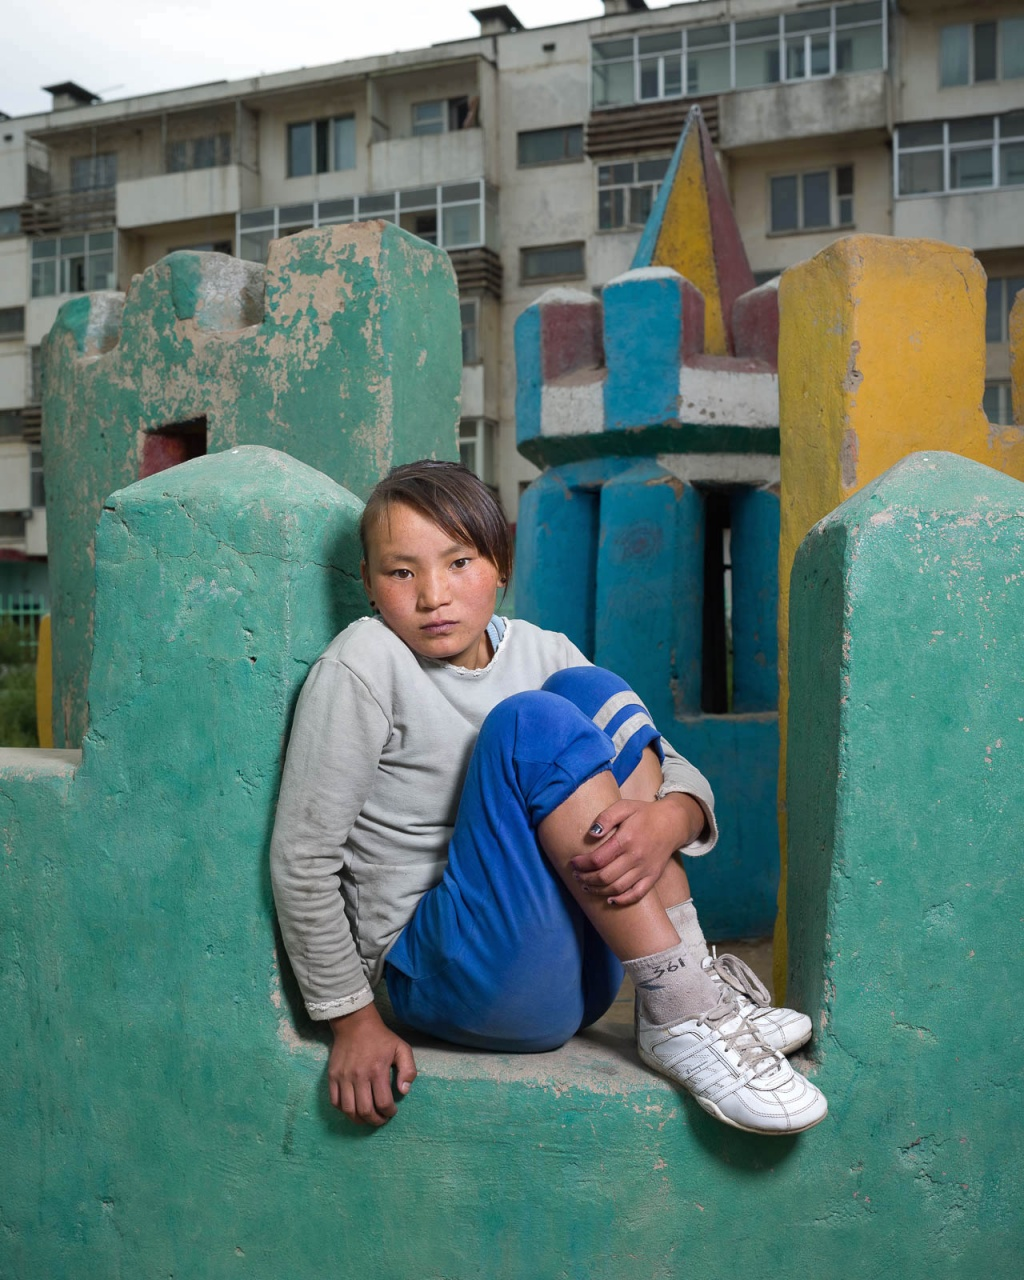 Global Steet Child